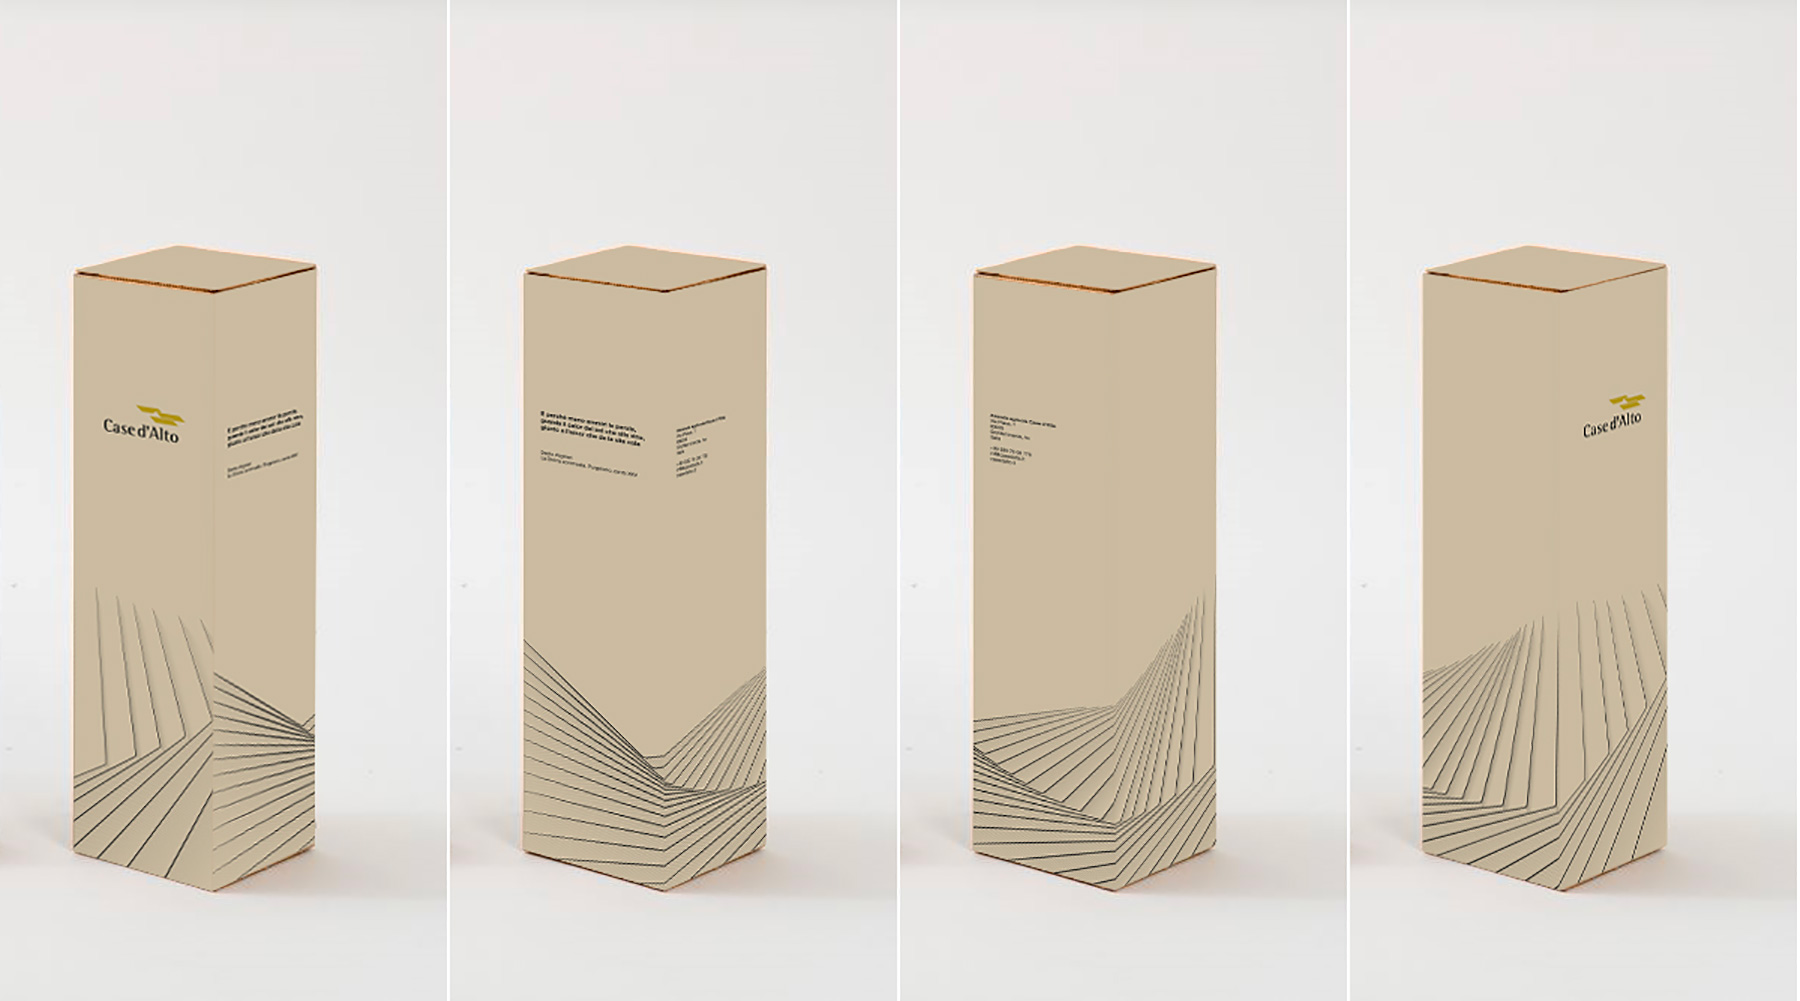 Case d'alto. Wine bottle carton box design, mockup